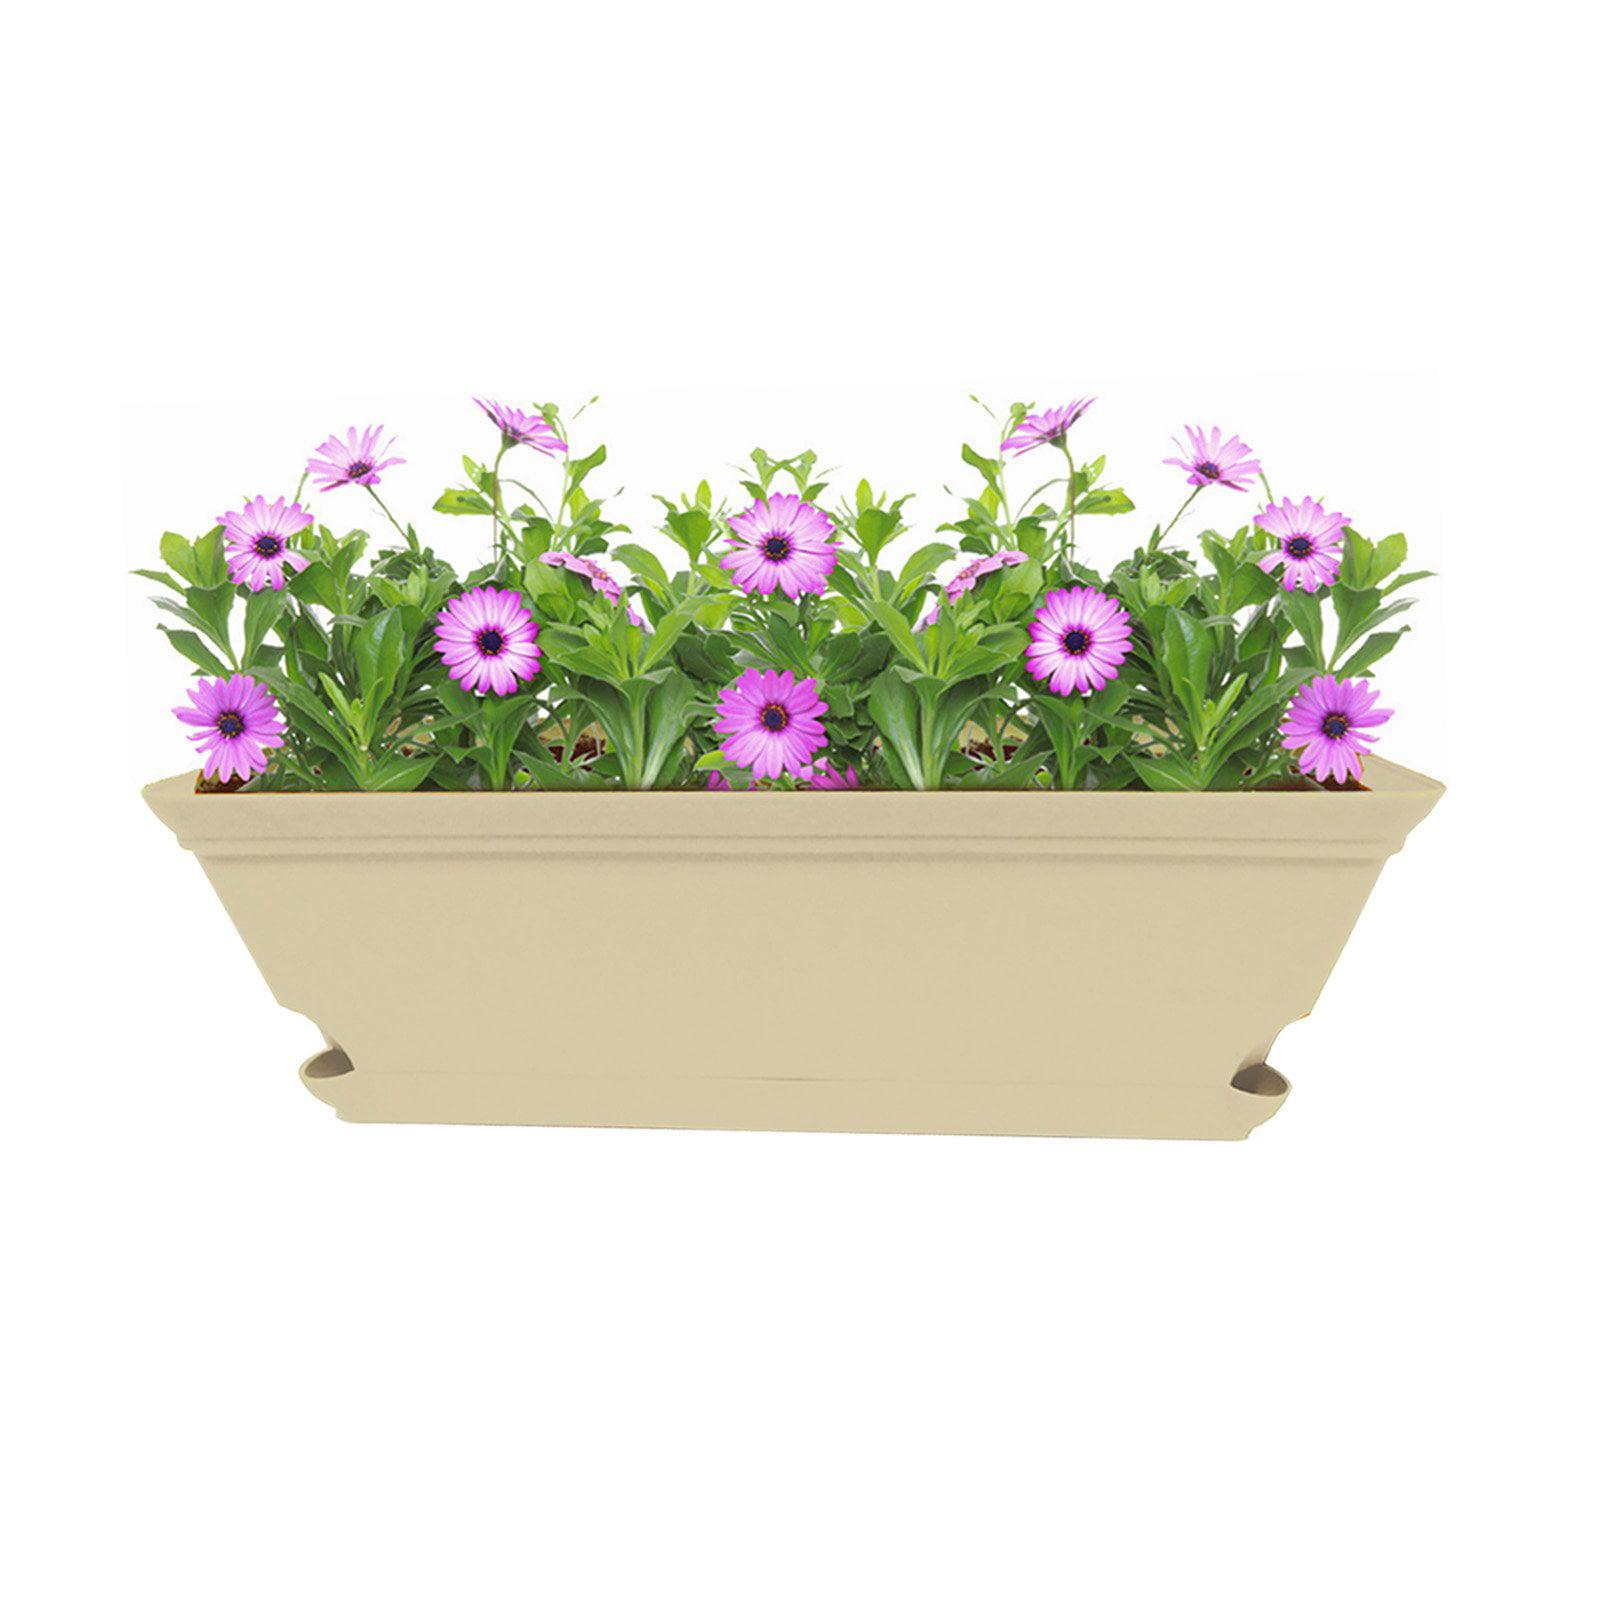 Missry 24 in. Self Watering Window Planter Box - Set of 2